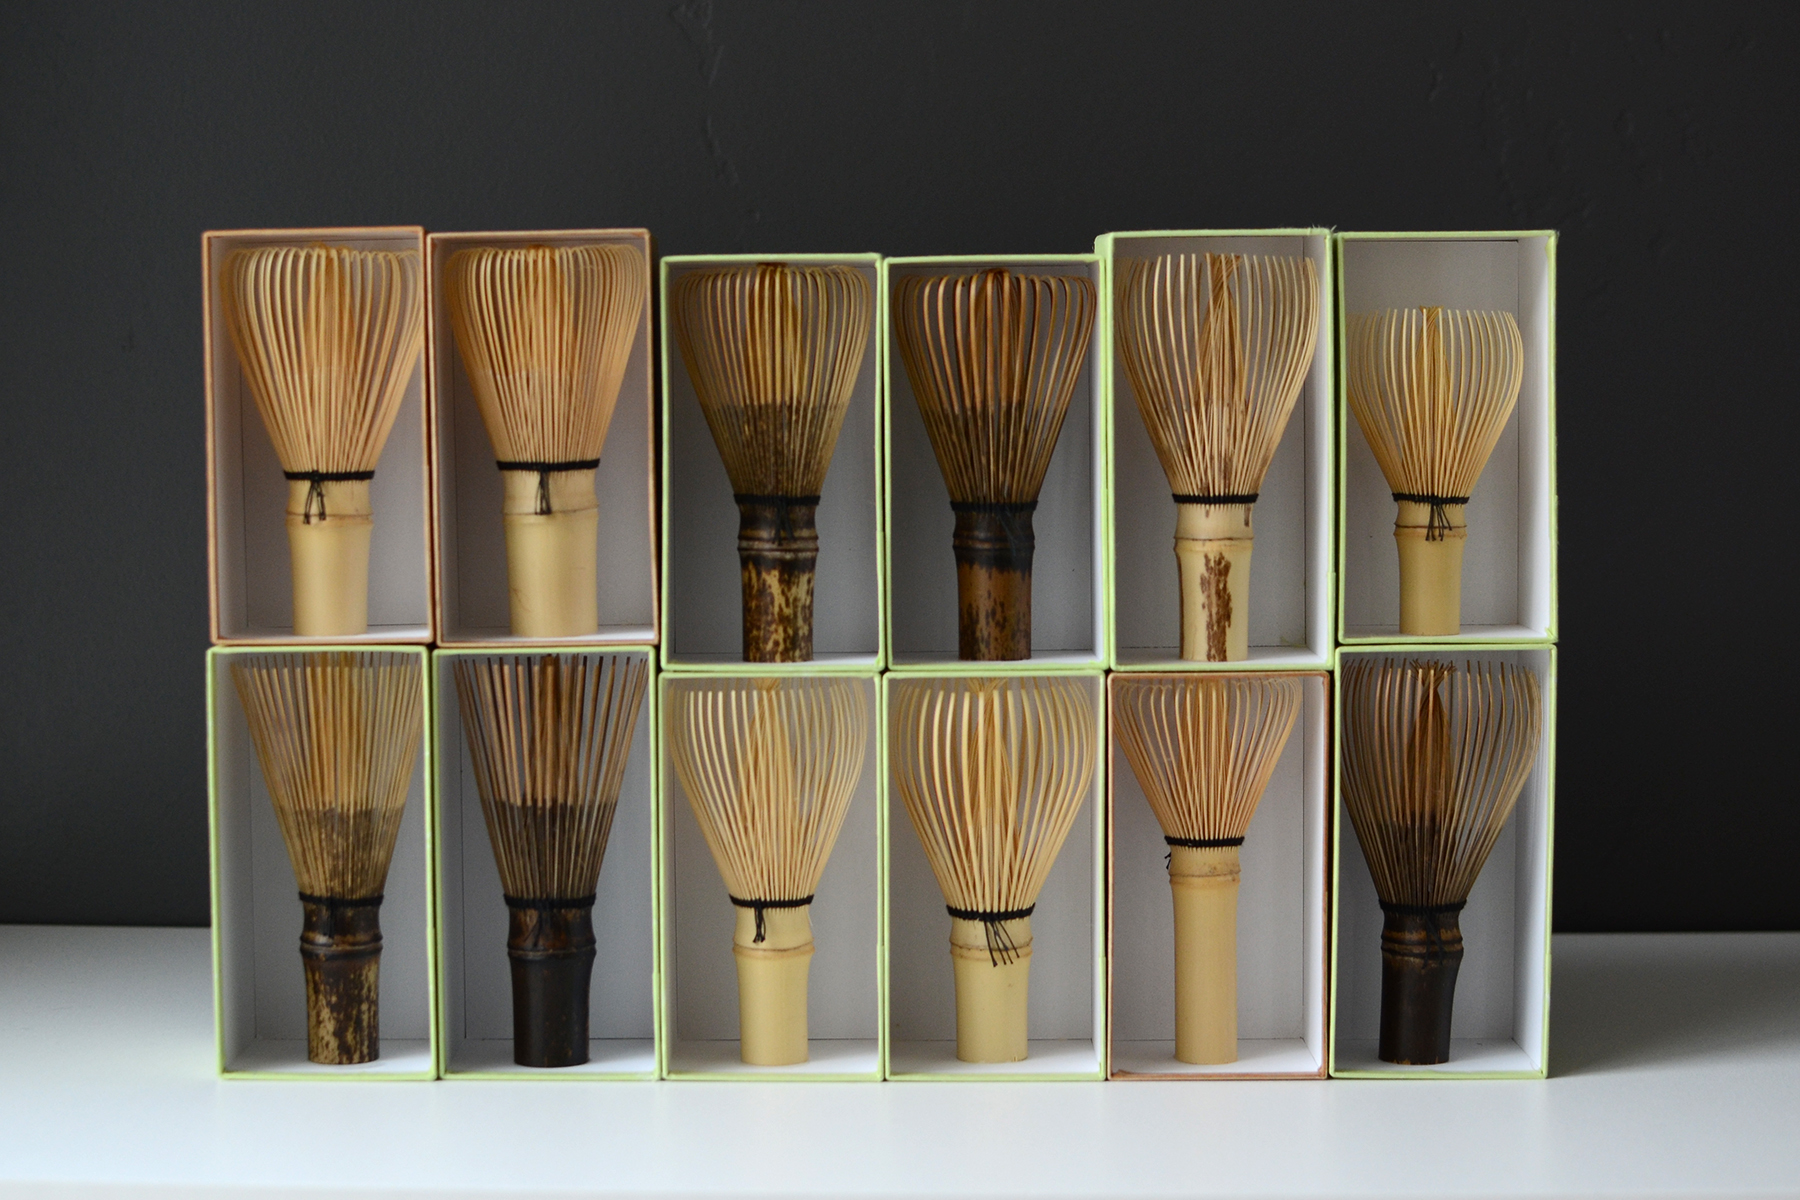 Tea Whisks by Tanimura Tango <br /> From the top left: Kazuho, Hachijuppondate, Sohenryu, Araho-Sohenryu, Unmondake shin-kazuho, Shin-kochasen <br /> From the bottom left: Soshuryu, Araho-Soshuryu, Shin-Kazuho, Shin-Araho, Tenmoku, Kurotake Shin Kazuho